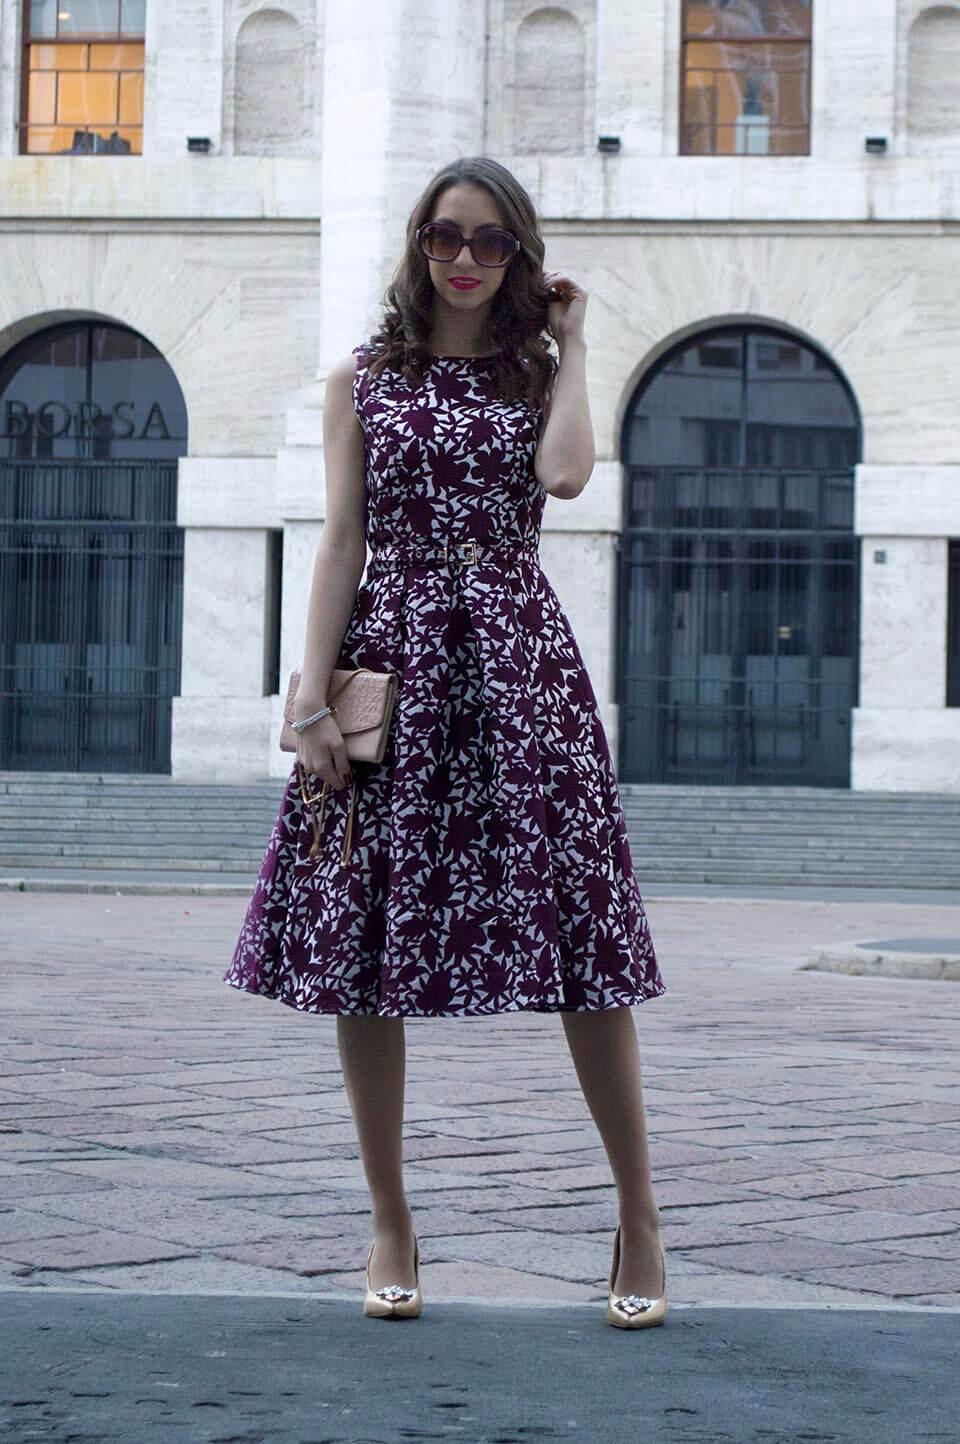 Midi Dress outfit - Manu Luize